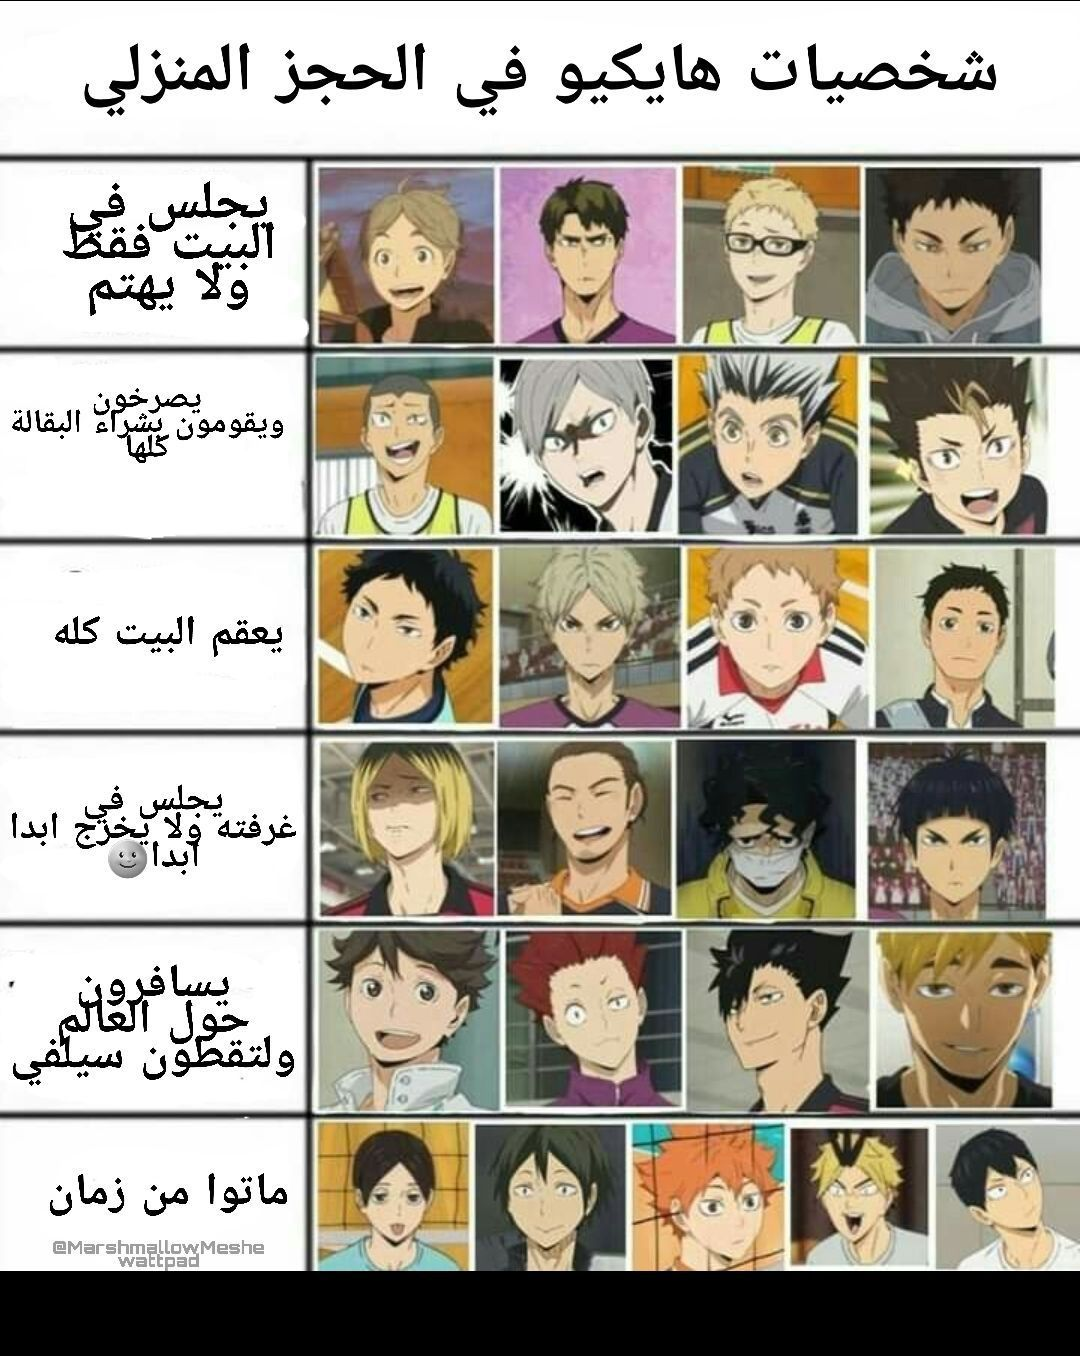 Aiimye Tniigѕ محادثات شخصيات الانمي Anime Jokes Anime Funny Otaku Funny